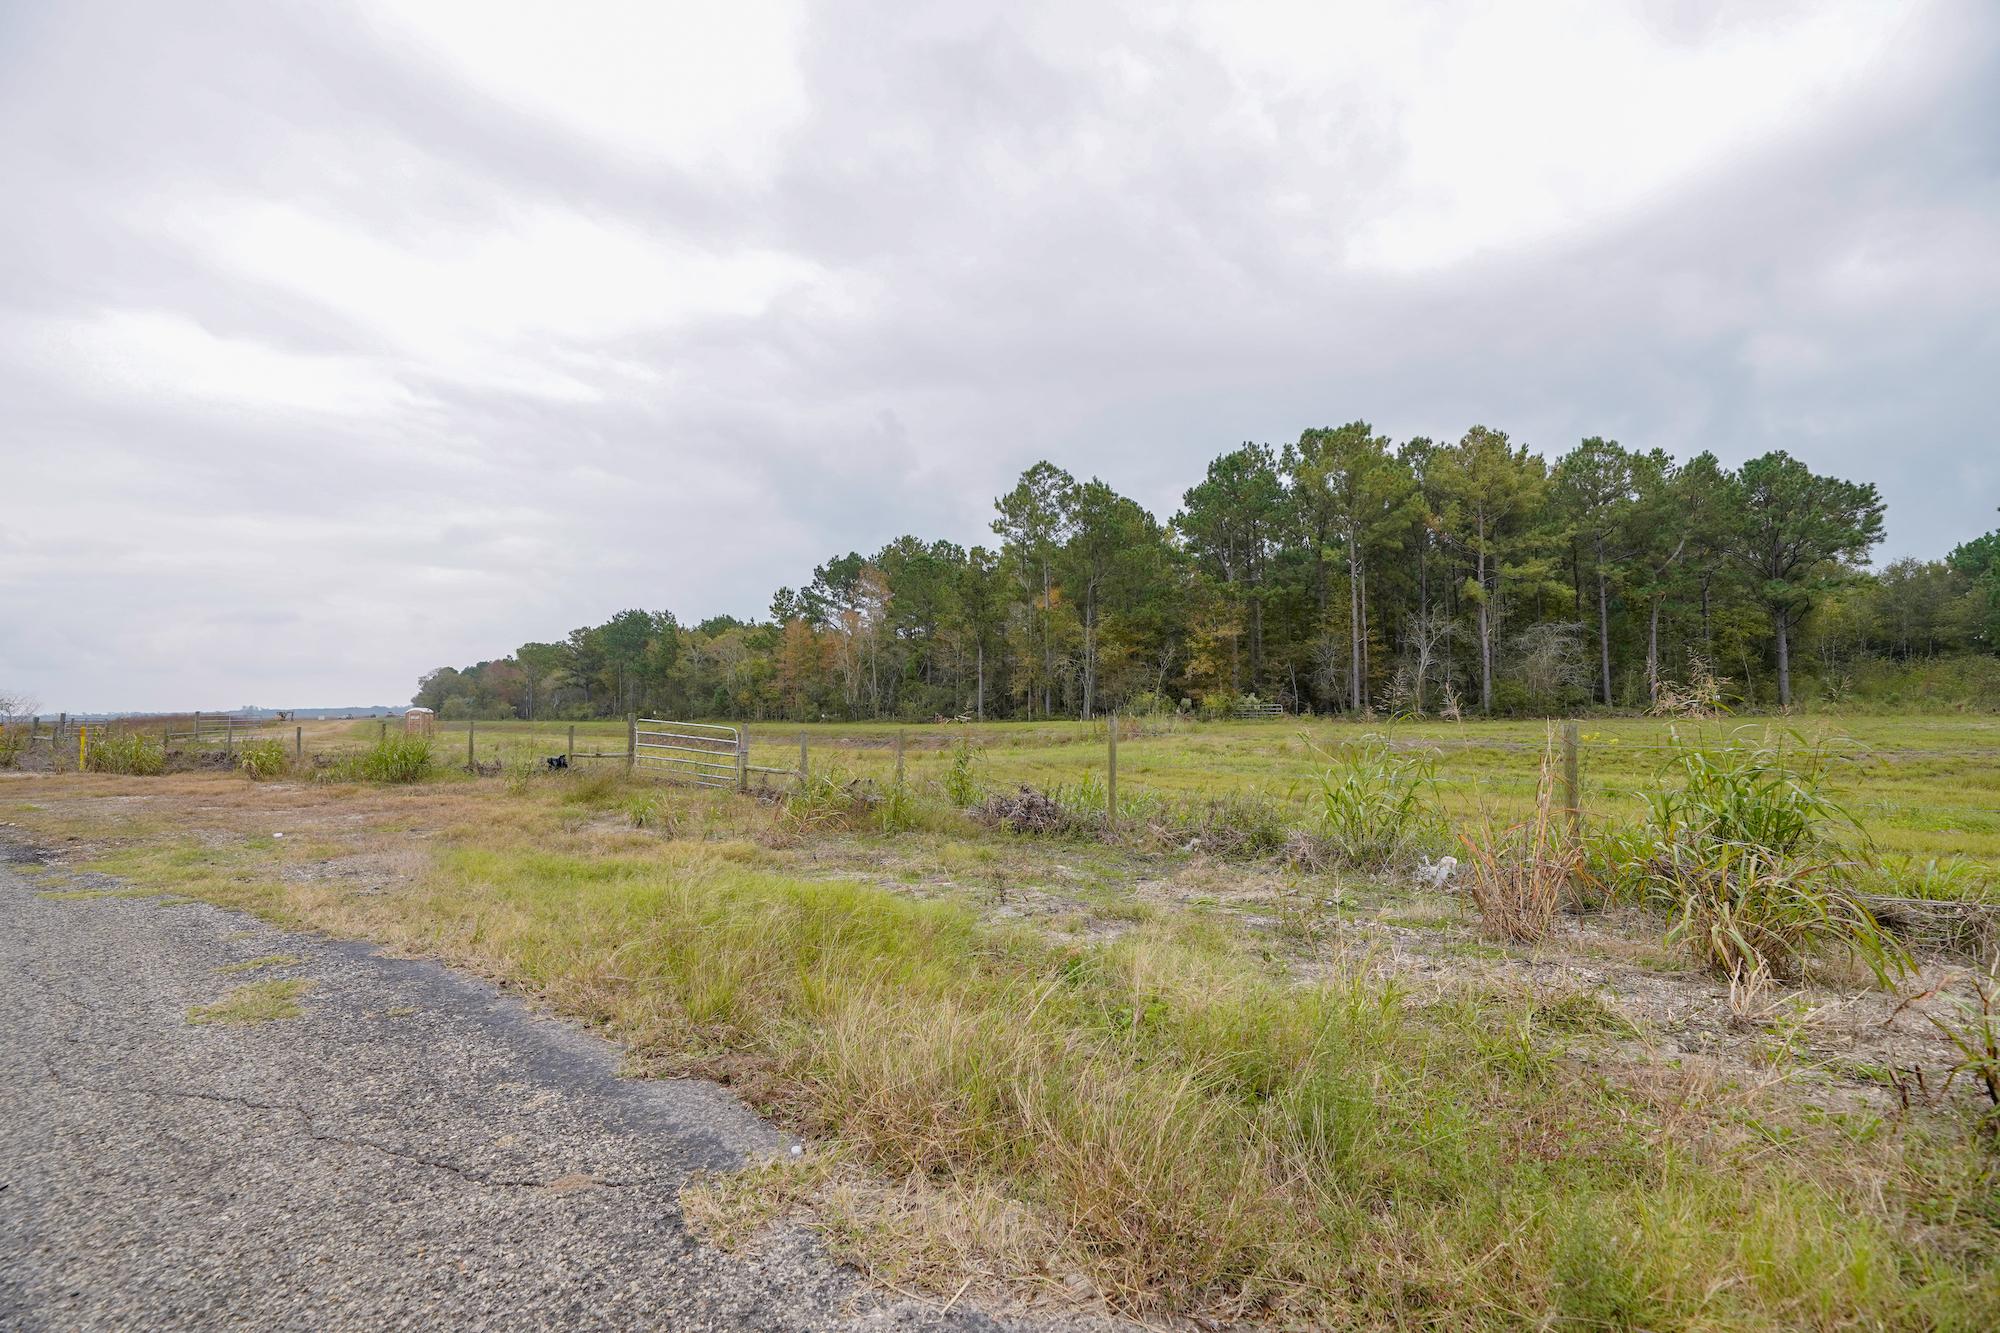 Jefferson County Development Land - Image 5 of 36